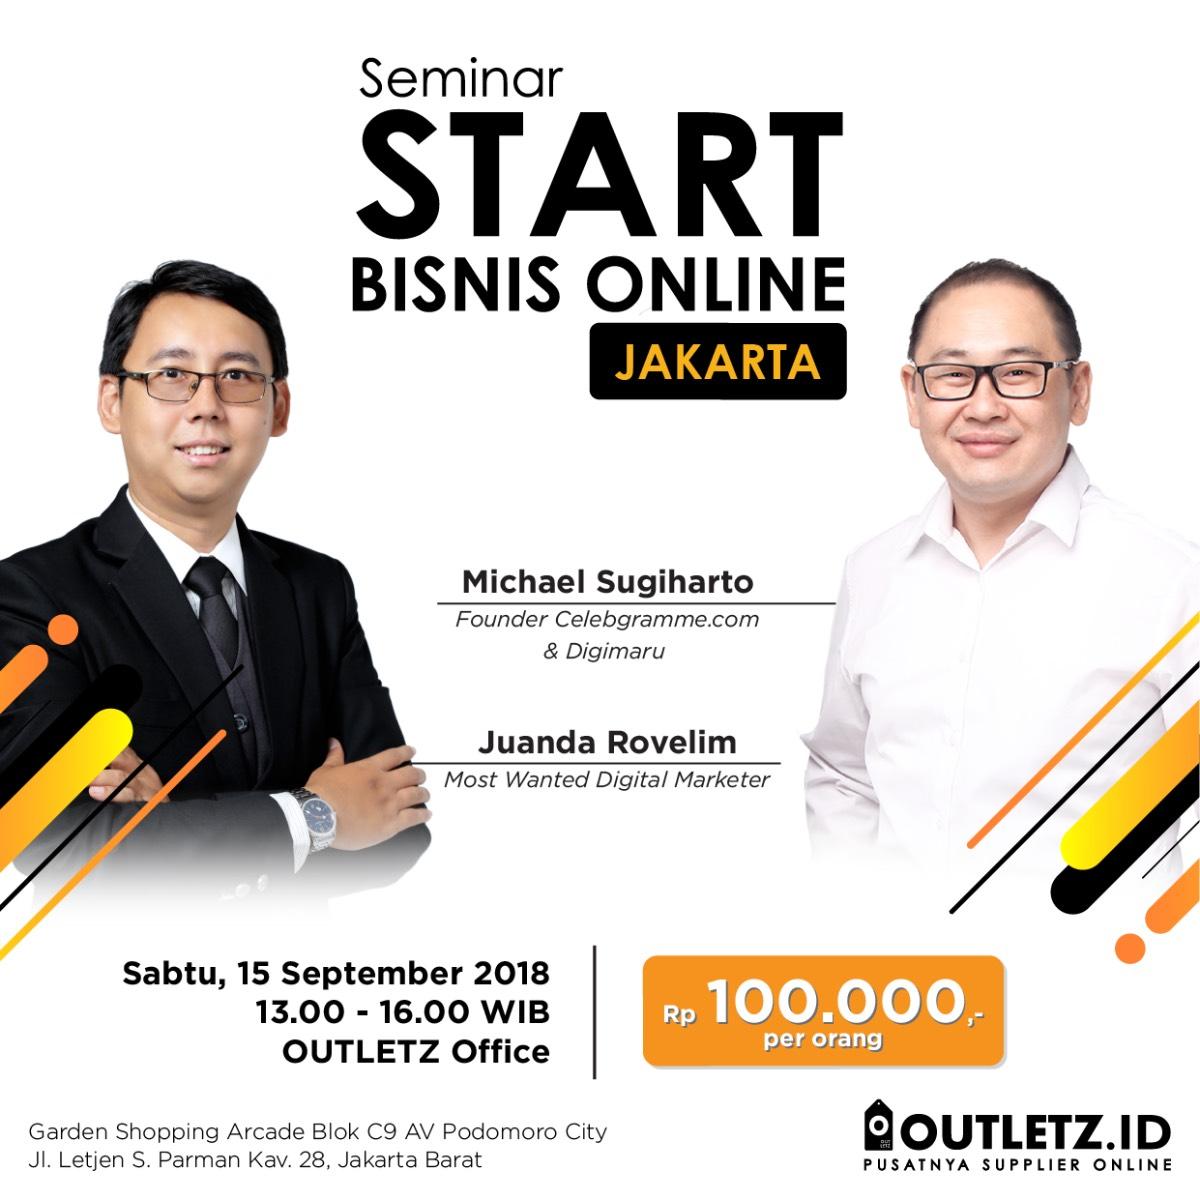 Seminar Start Bisnis Online Jakarta 15 September 2018